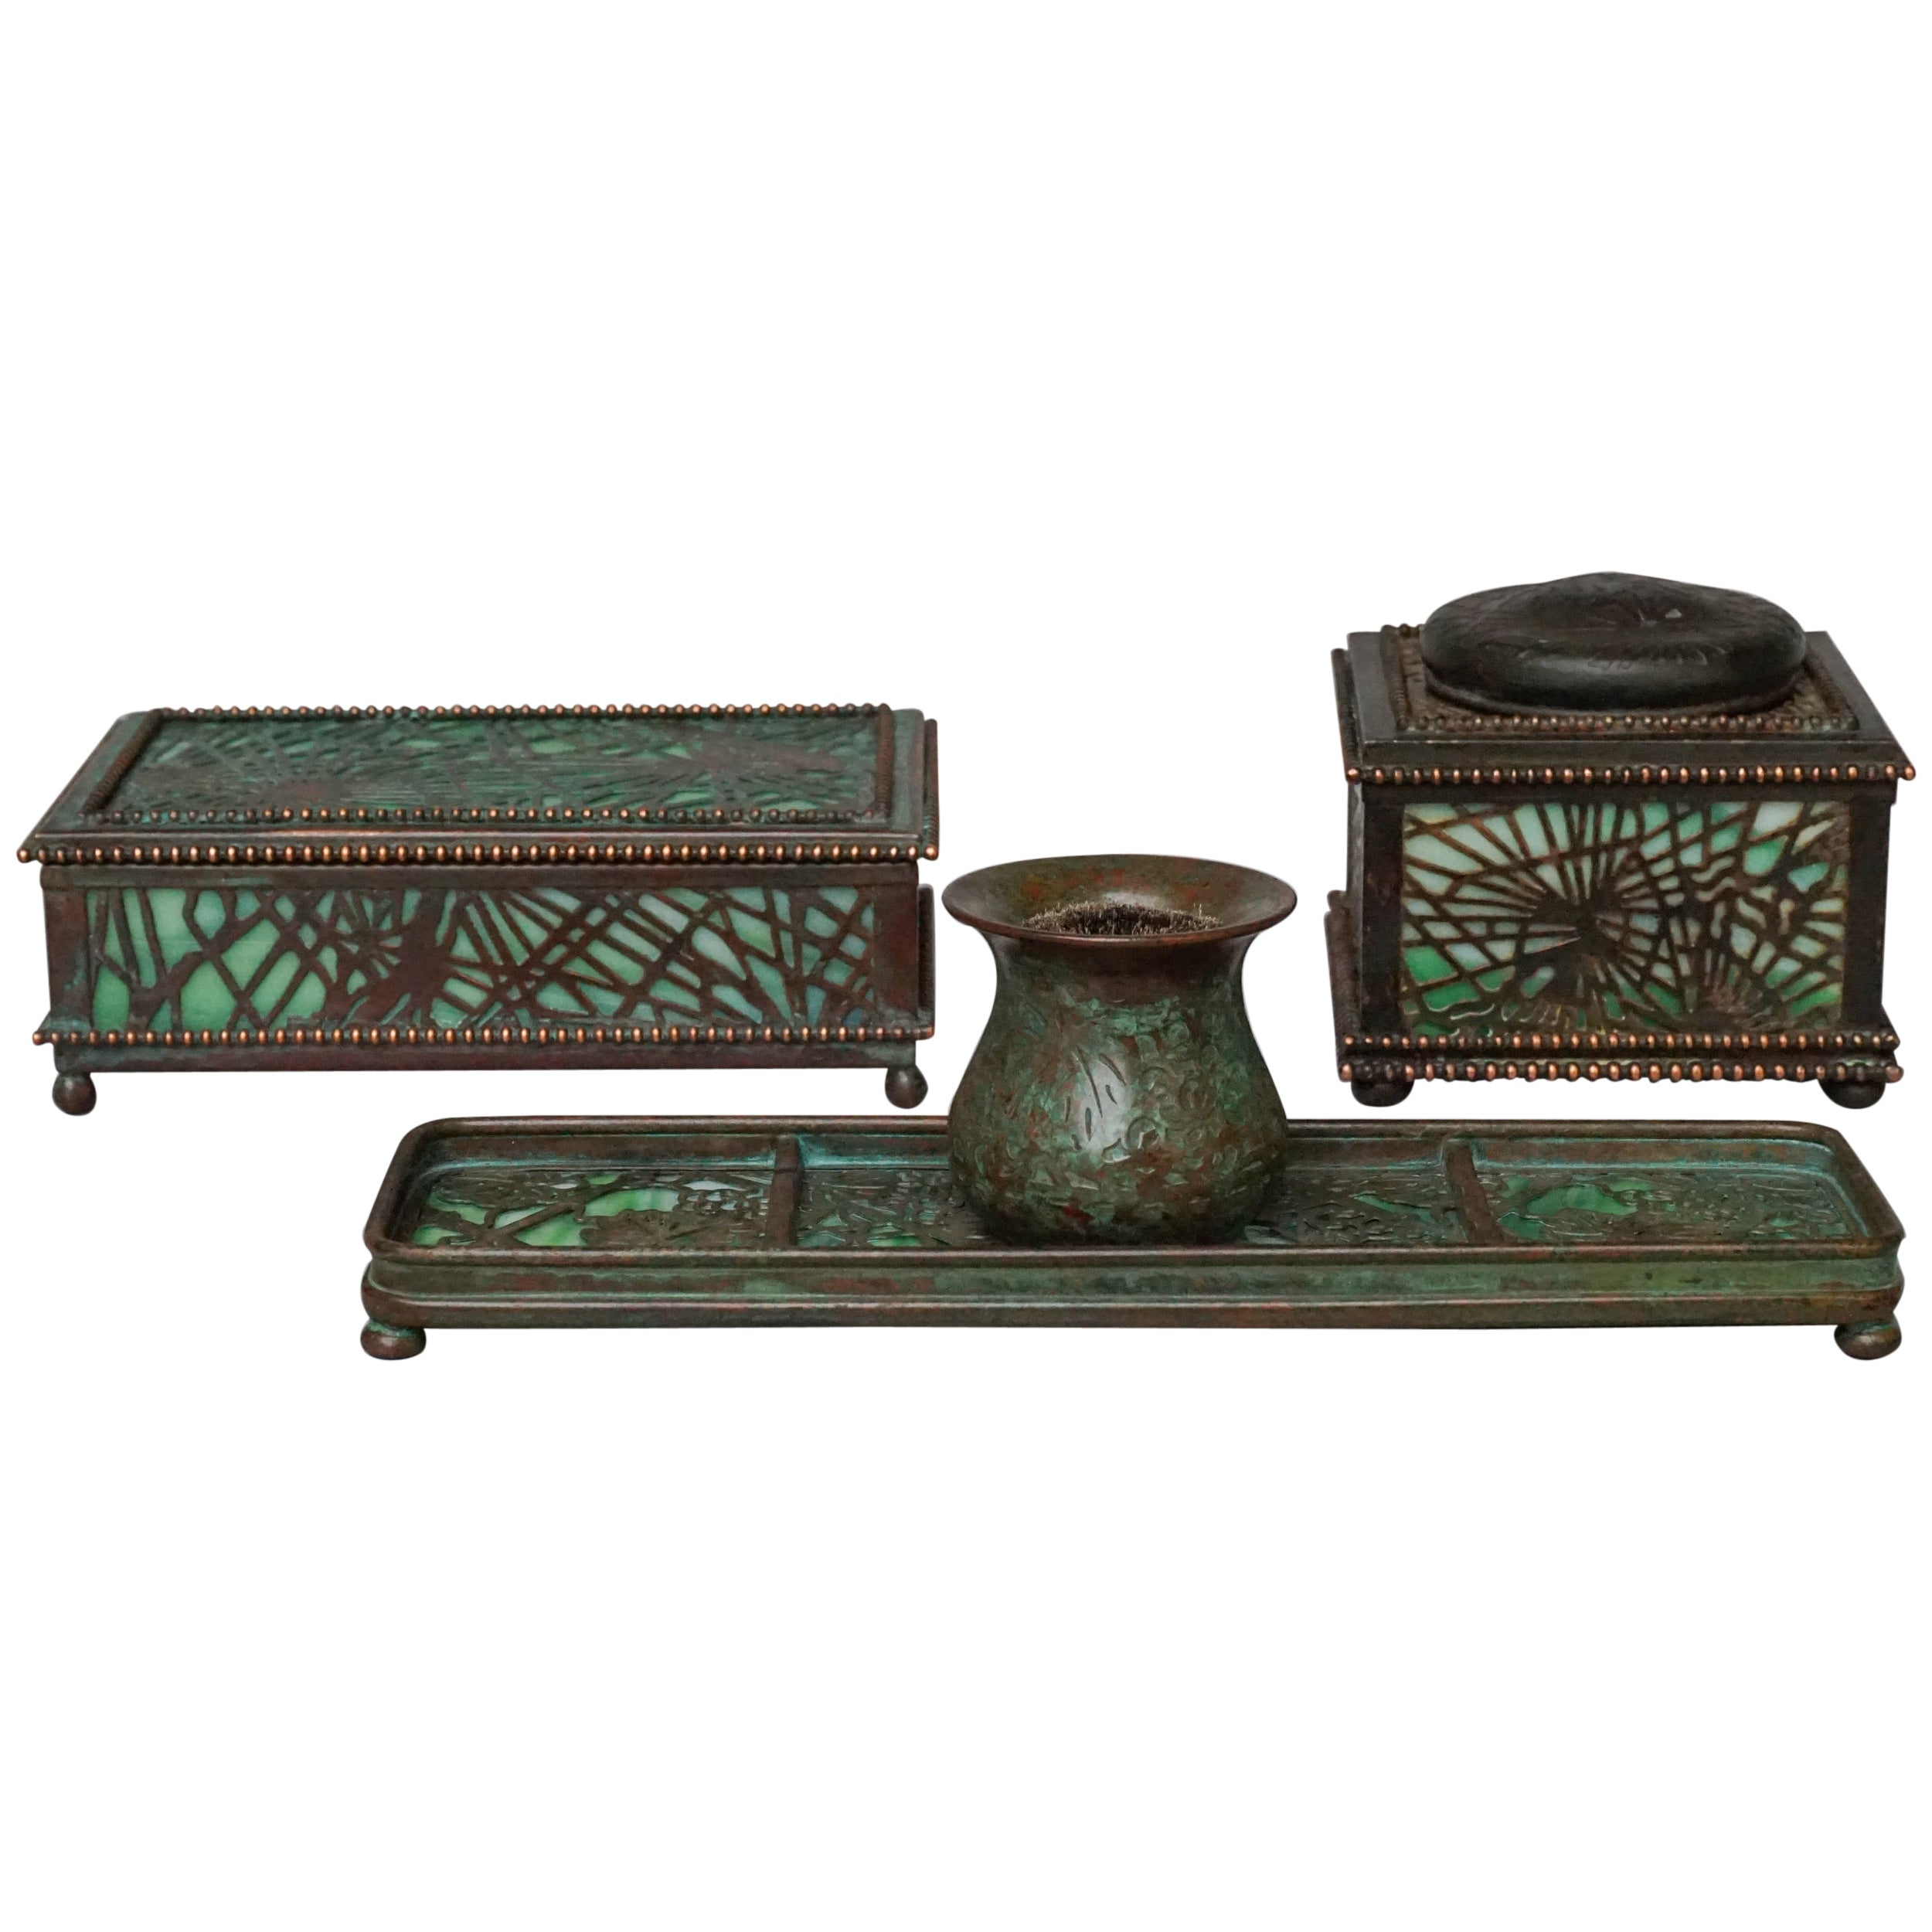 1905-1920 Green Slag Glass and Bronze Desk Set by Tiffany Studios New York